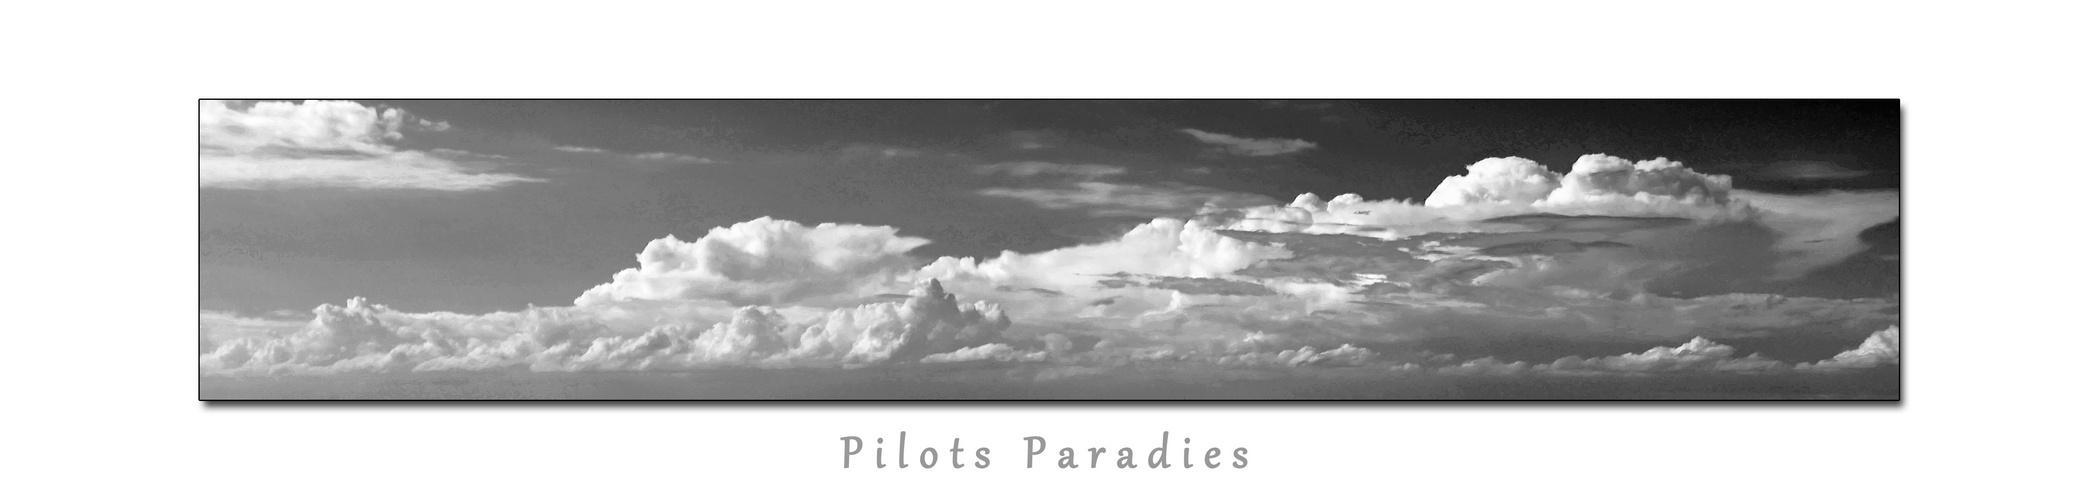 Pilots Paradies